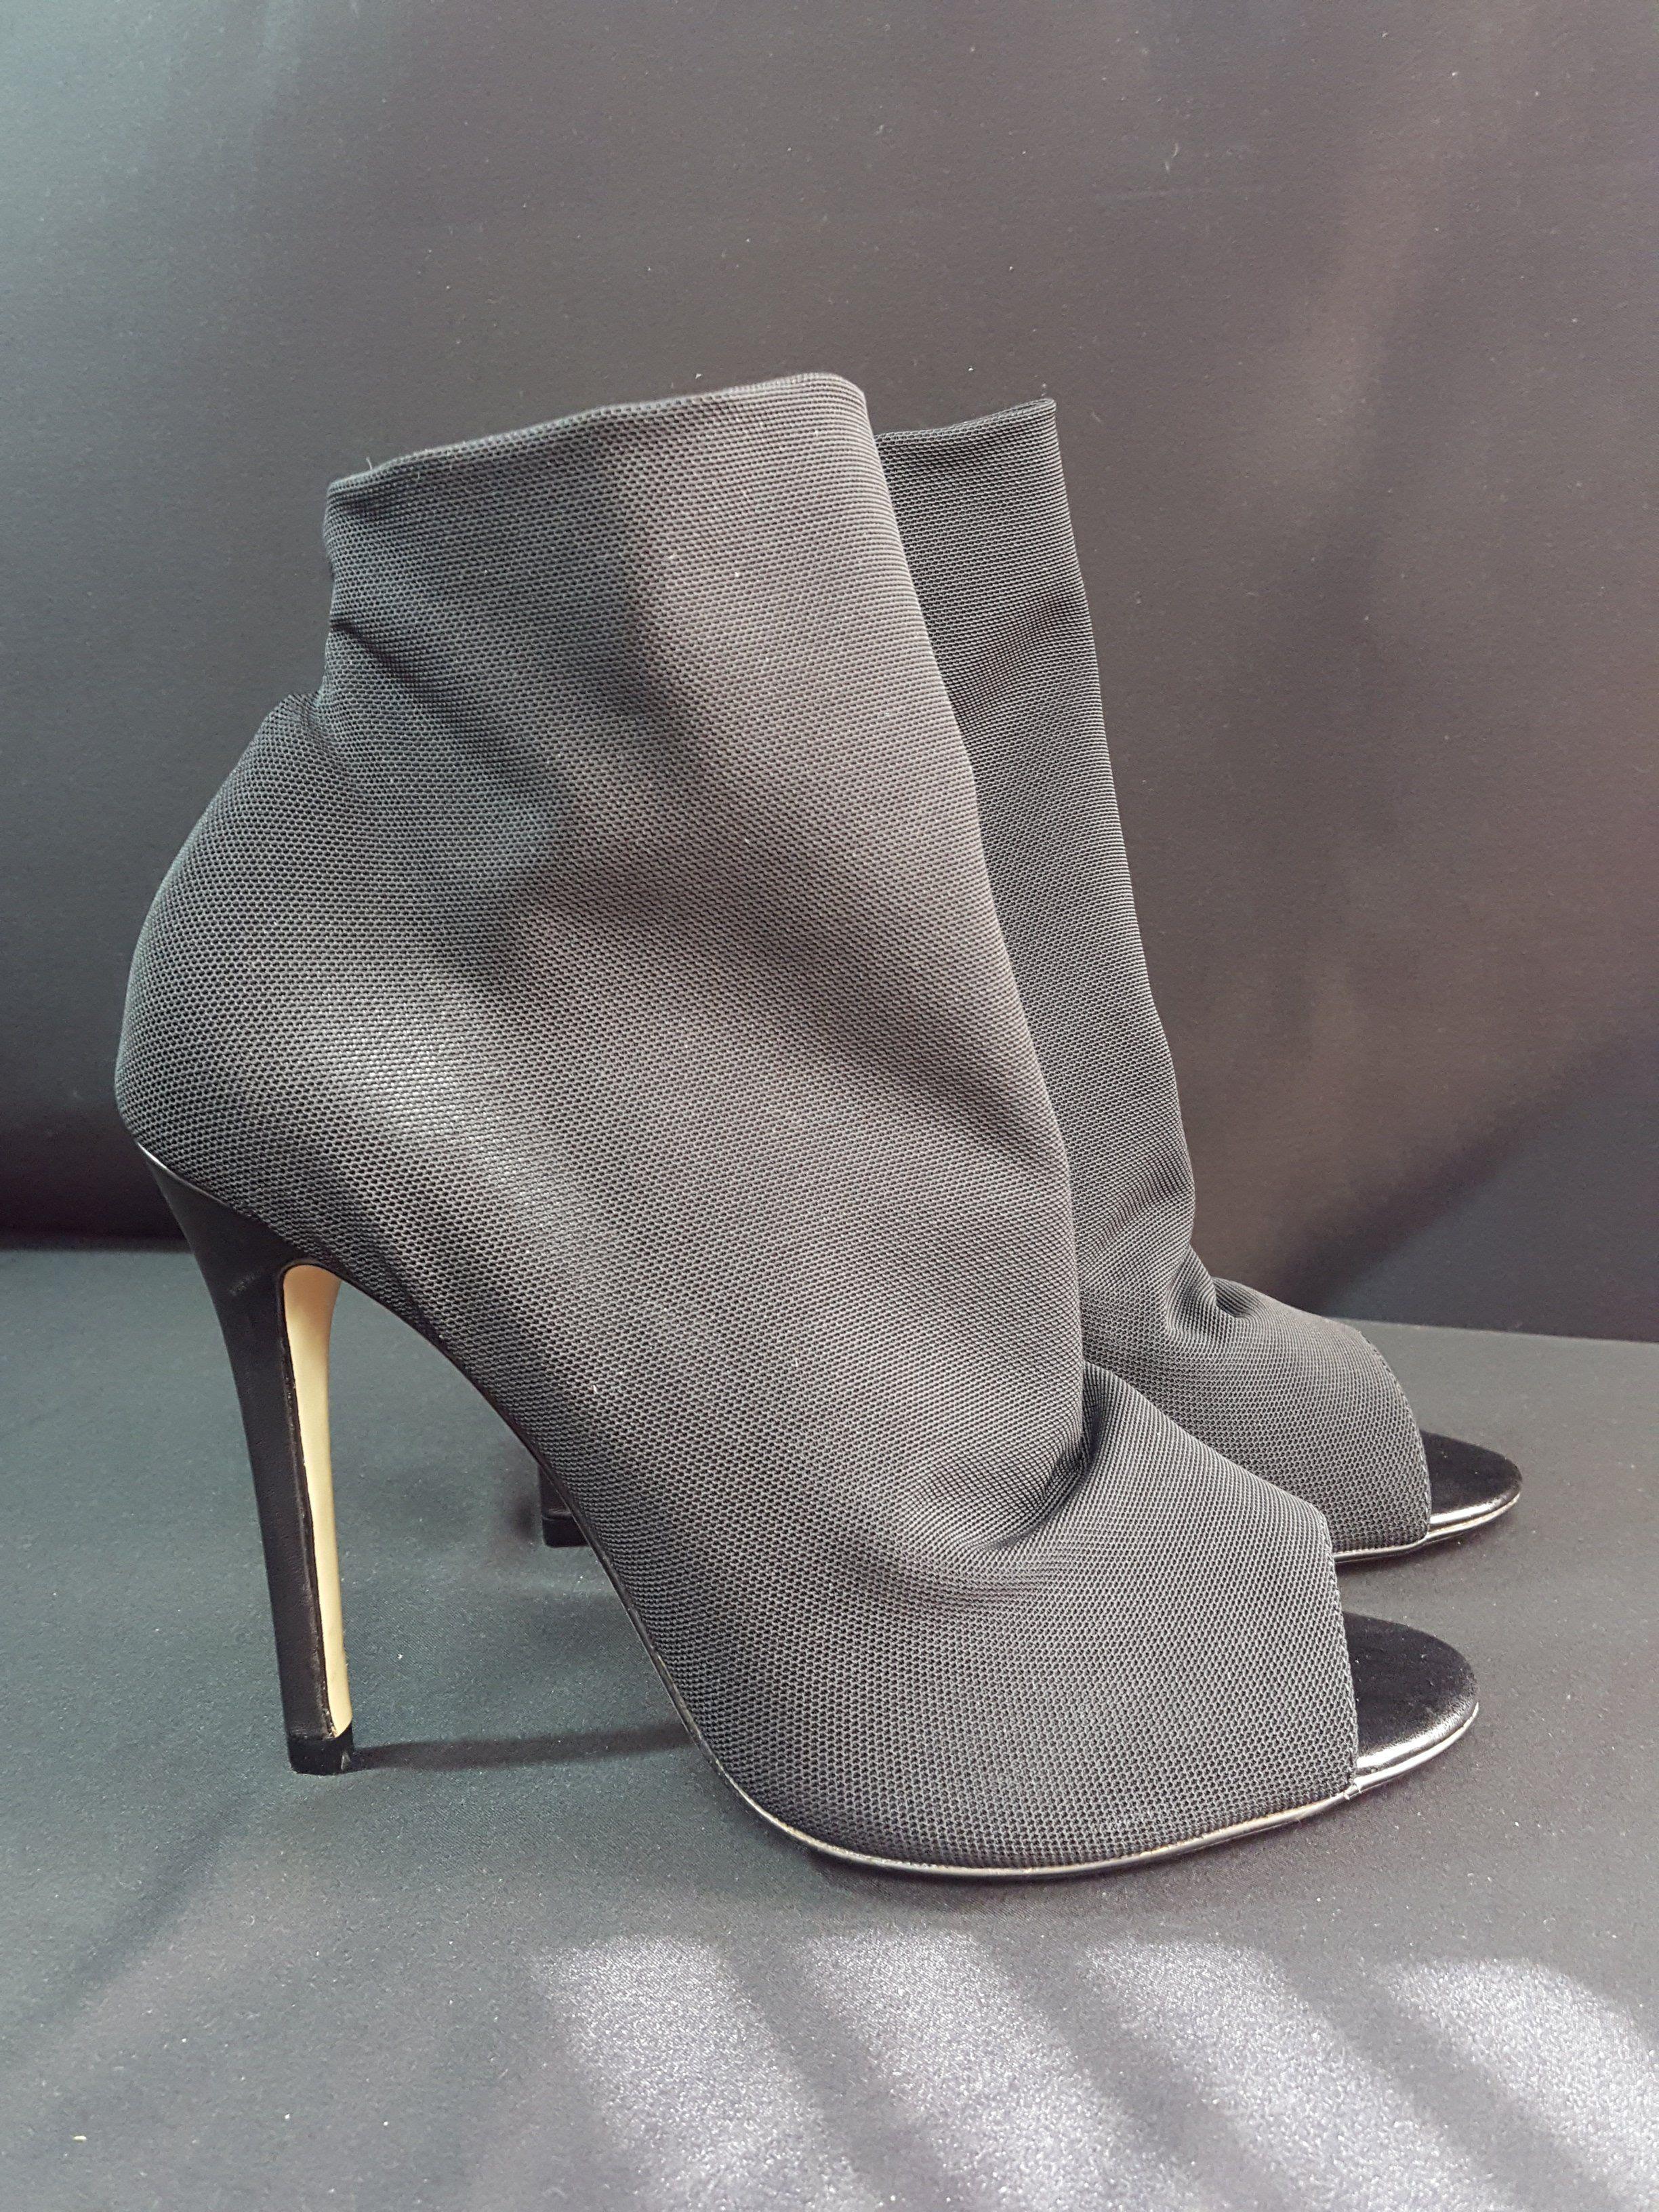 aa846574c79 Karen Millen Black Elastic Peep Toe Shoe Boot Sz. 38 #resaleshop  #stylebloggers #fashion #potd #samplesales #com #blackgirlfly #ebay  #secondhand # ...